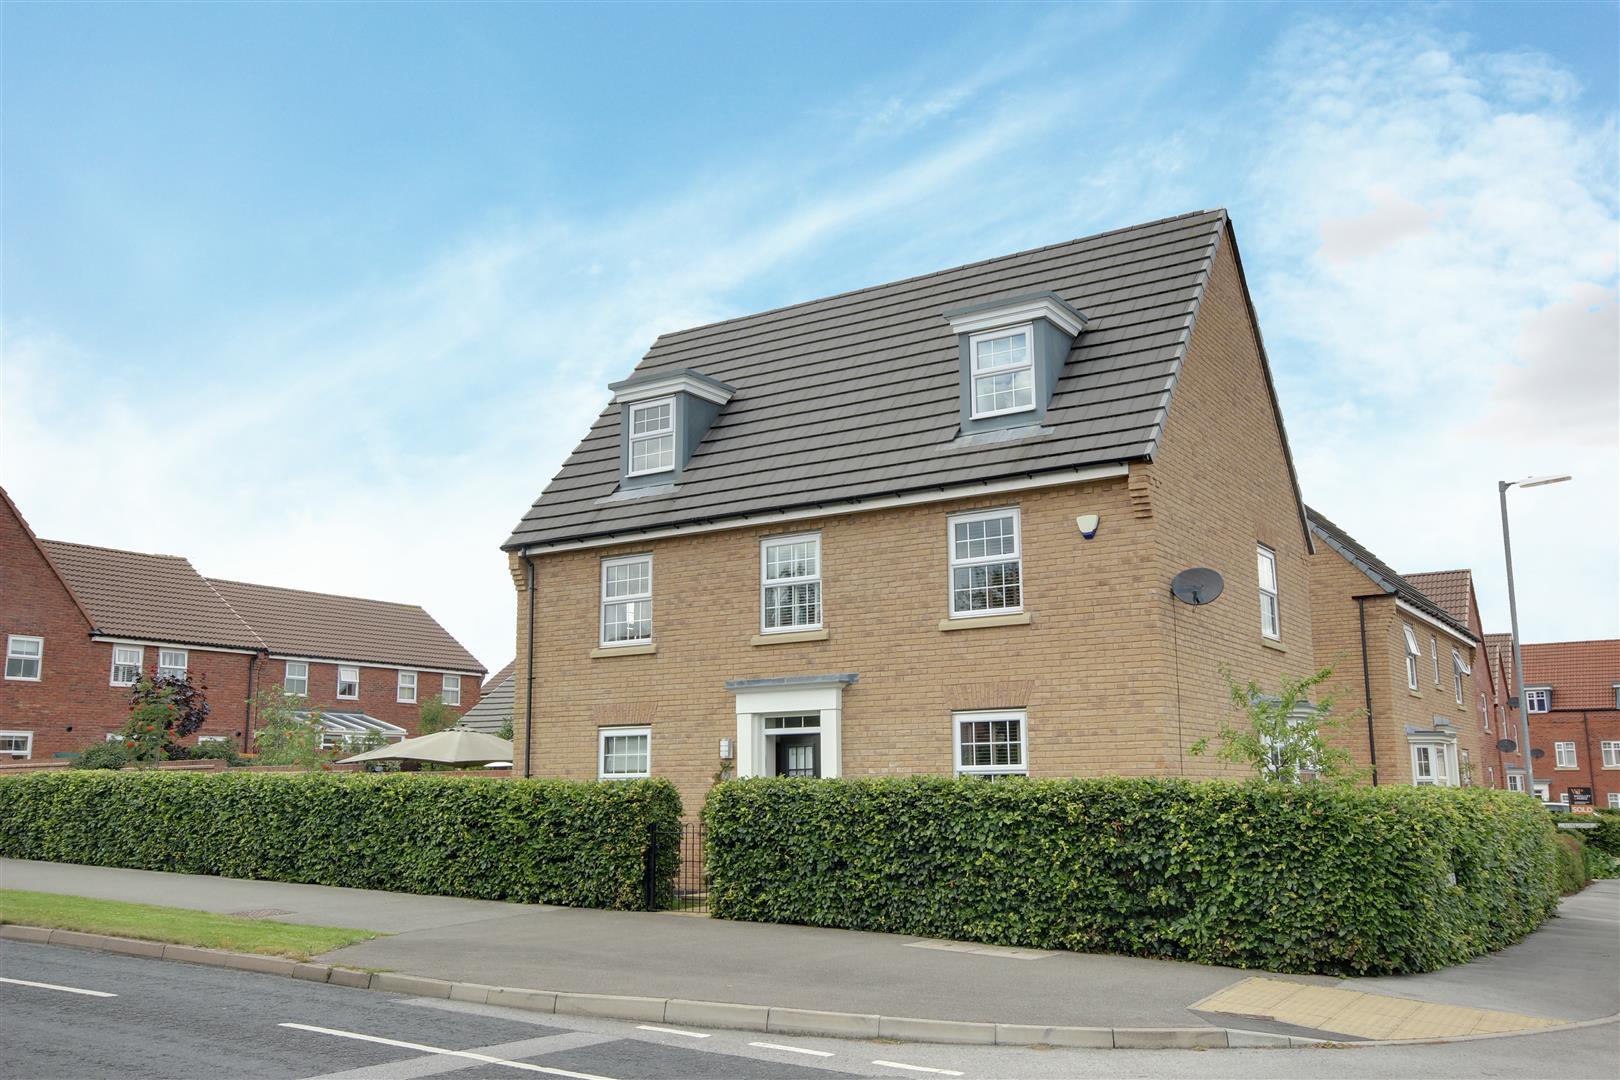 154 Woodhall Way, Beverley, 154, HU17 7DA